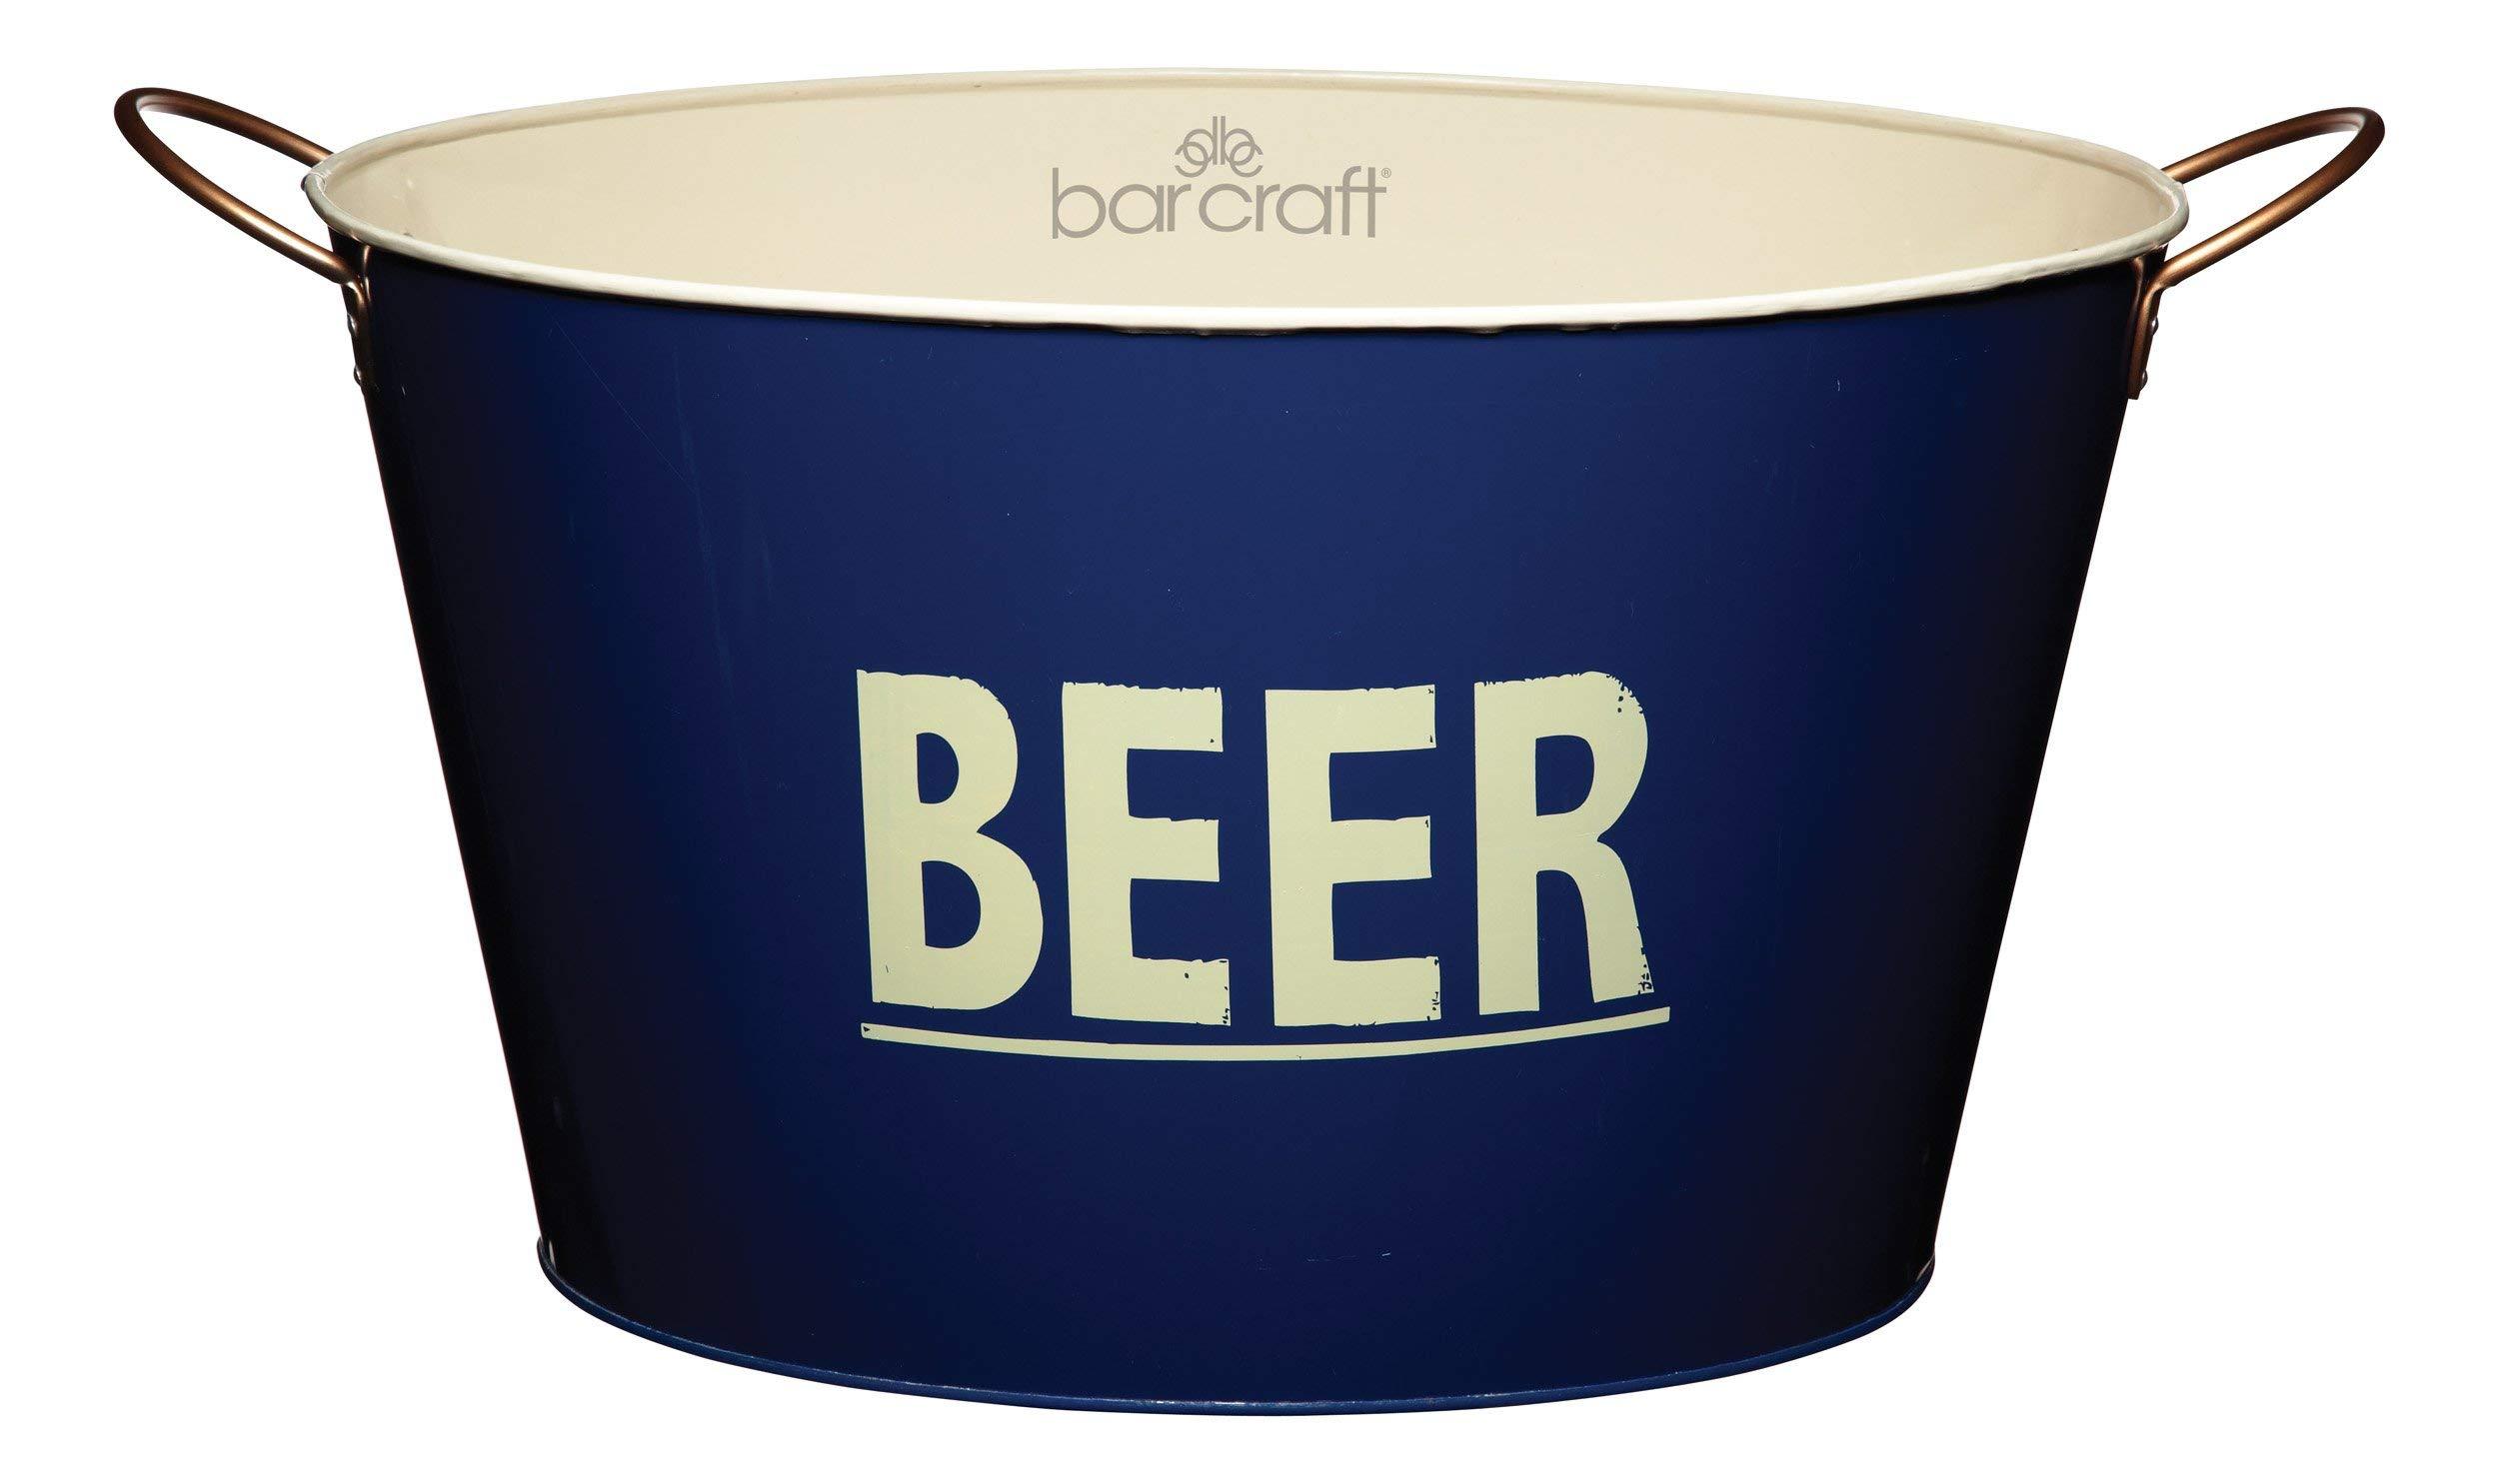 marymarygardens Beer Bucket Cooler Cold Beer Design